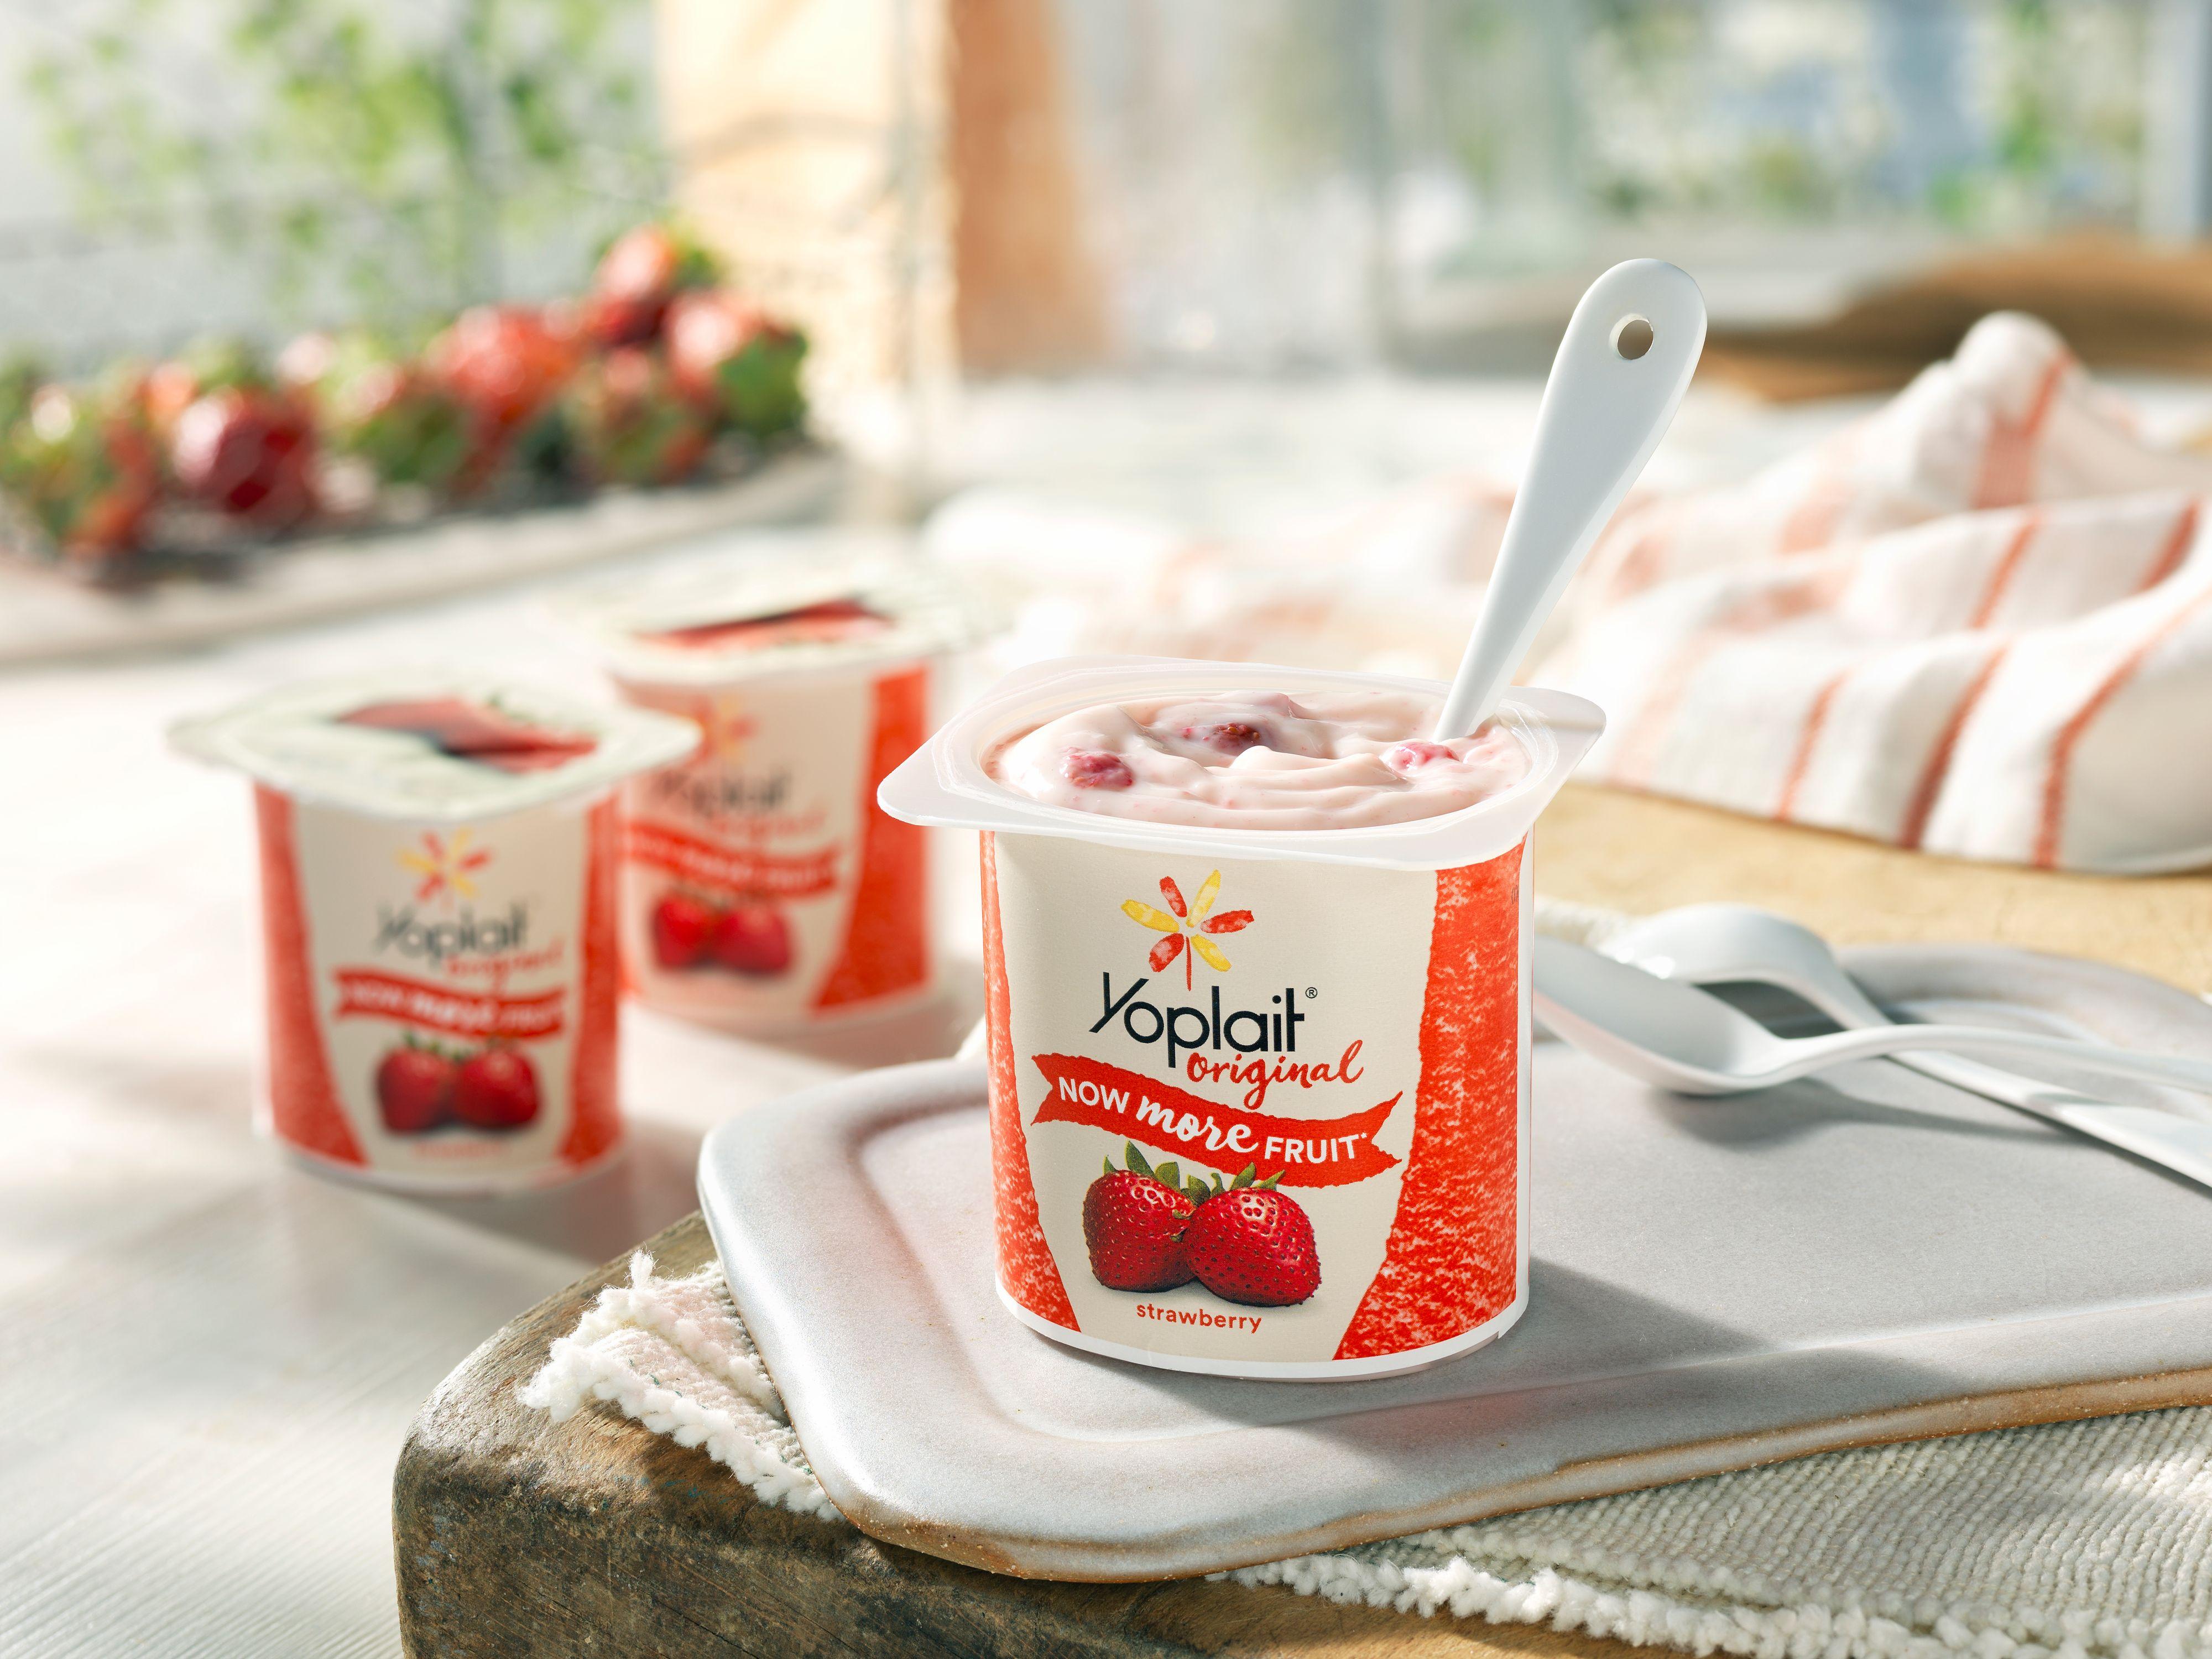 lisa bishop food stylist- Yoplait yogurt